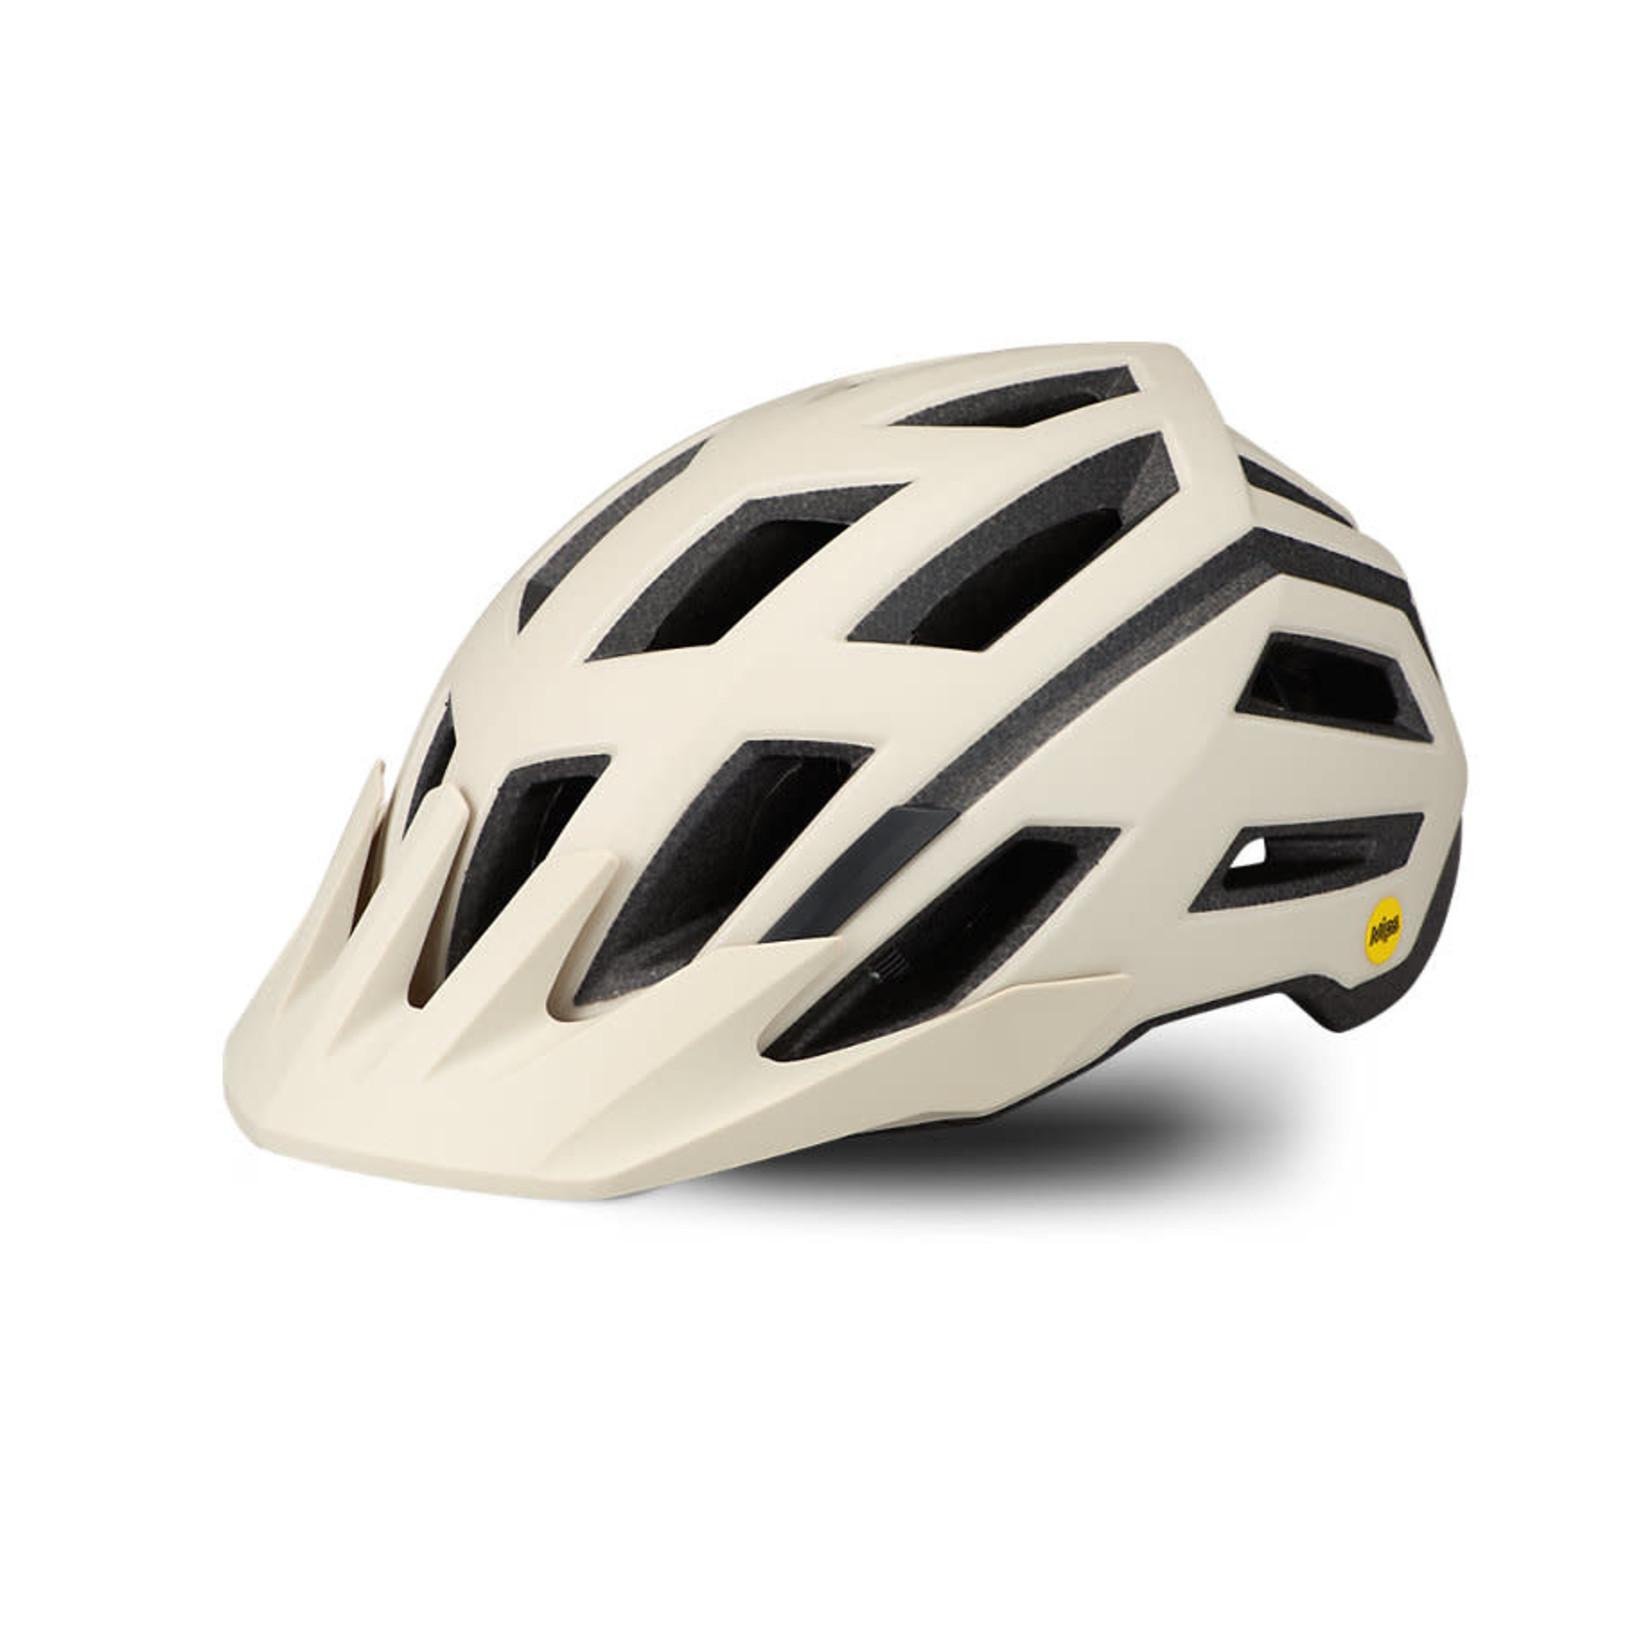 Specialized Specialized Tactic III MIPS Helmet